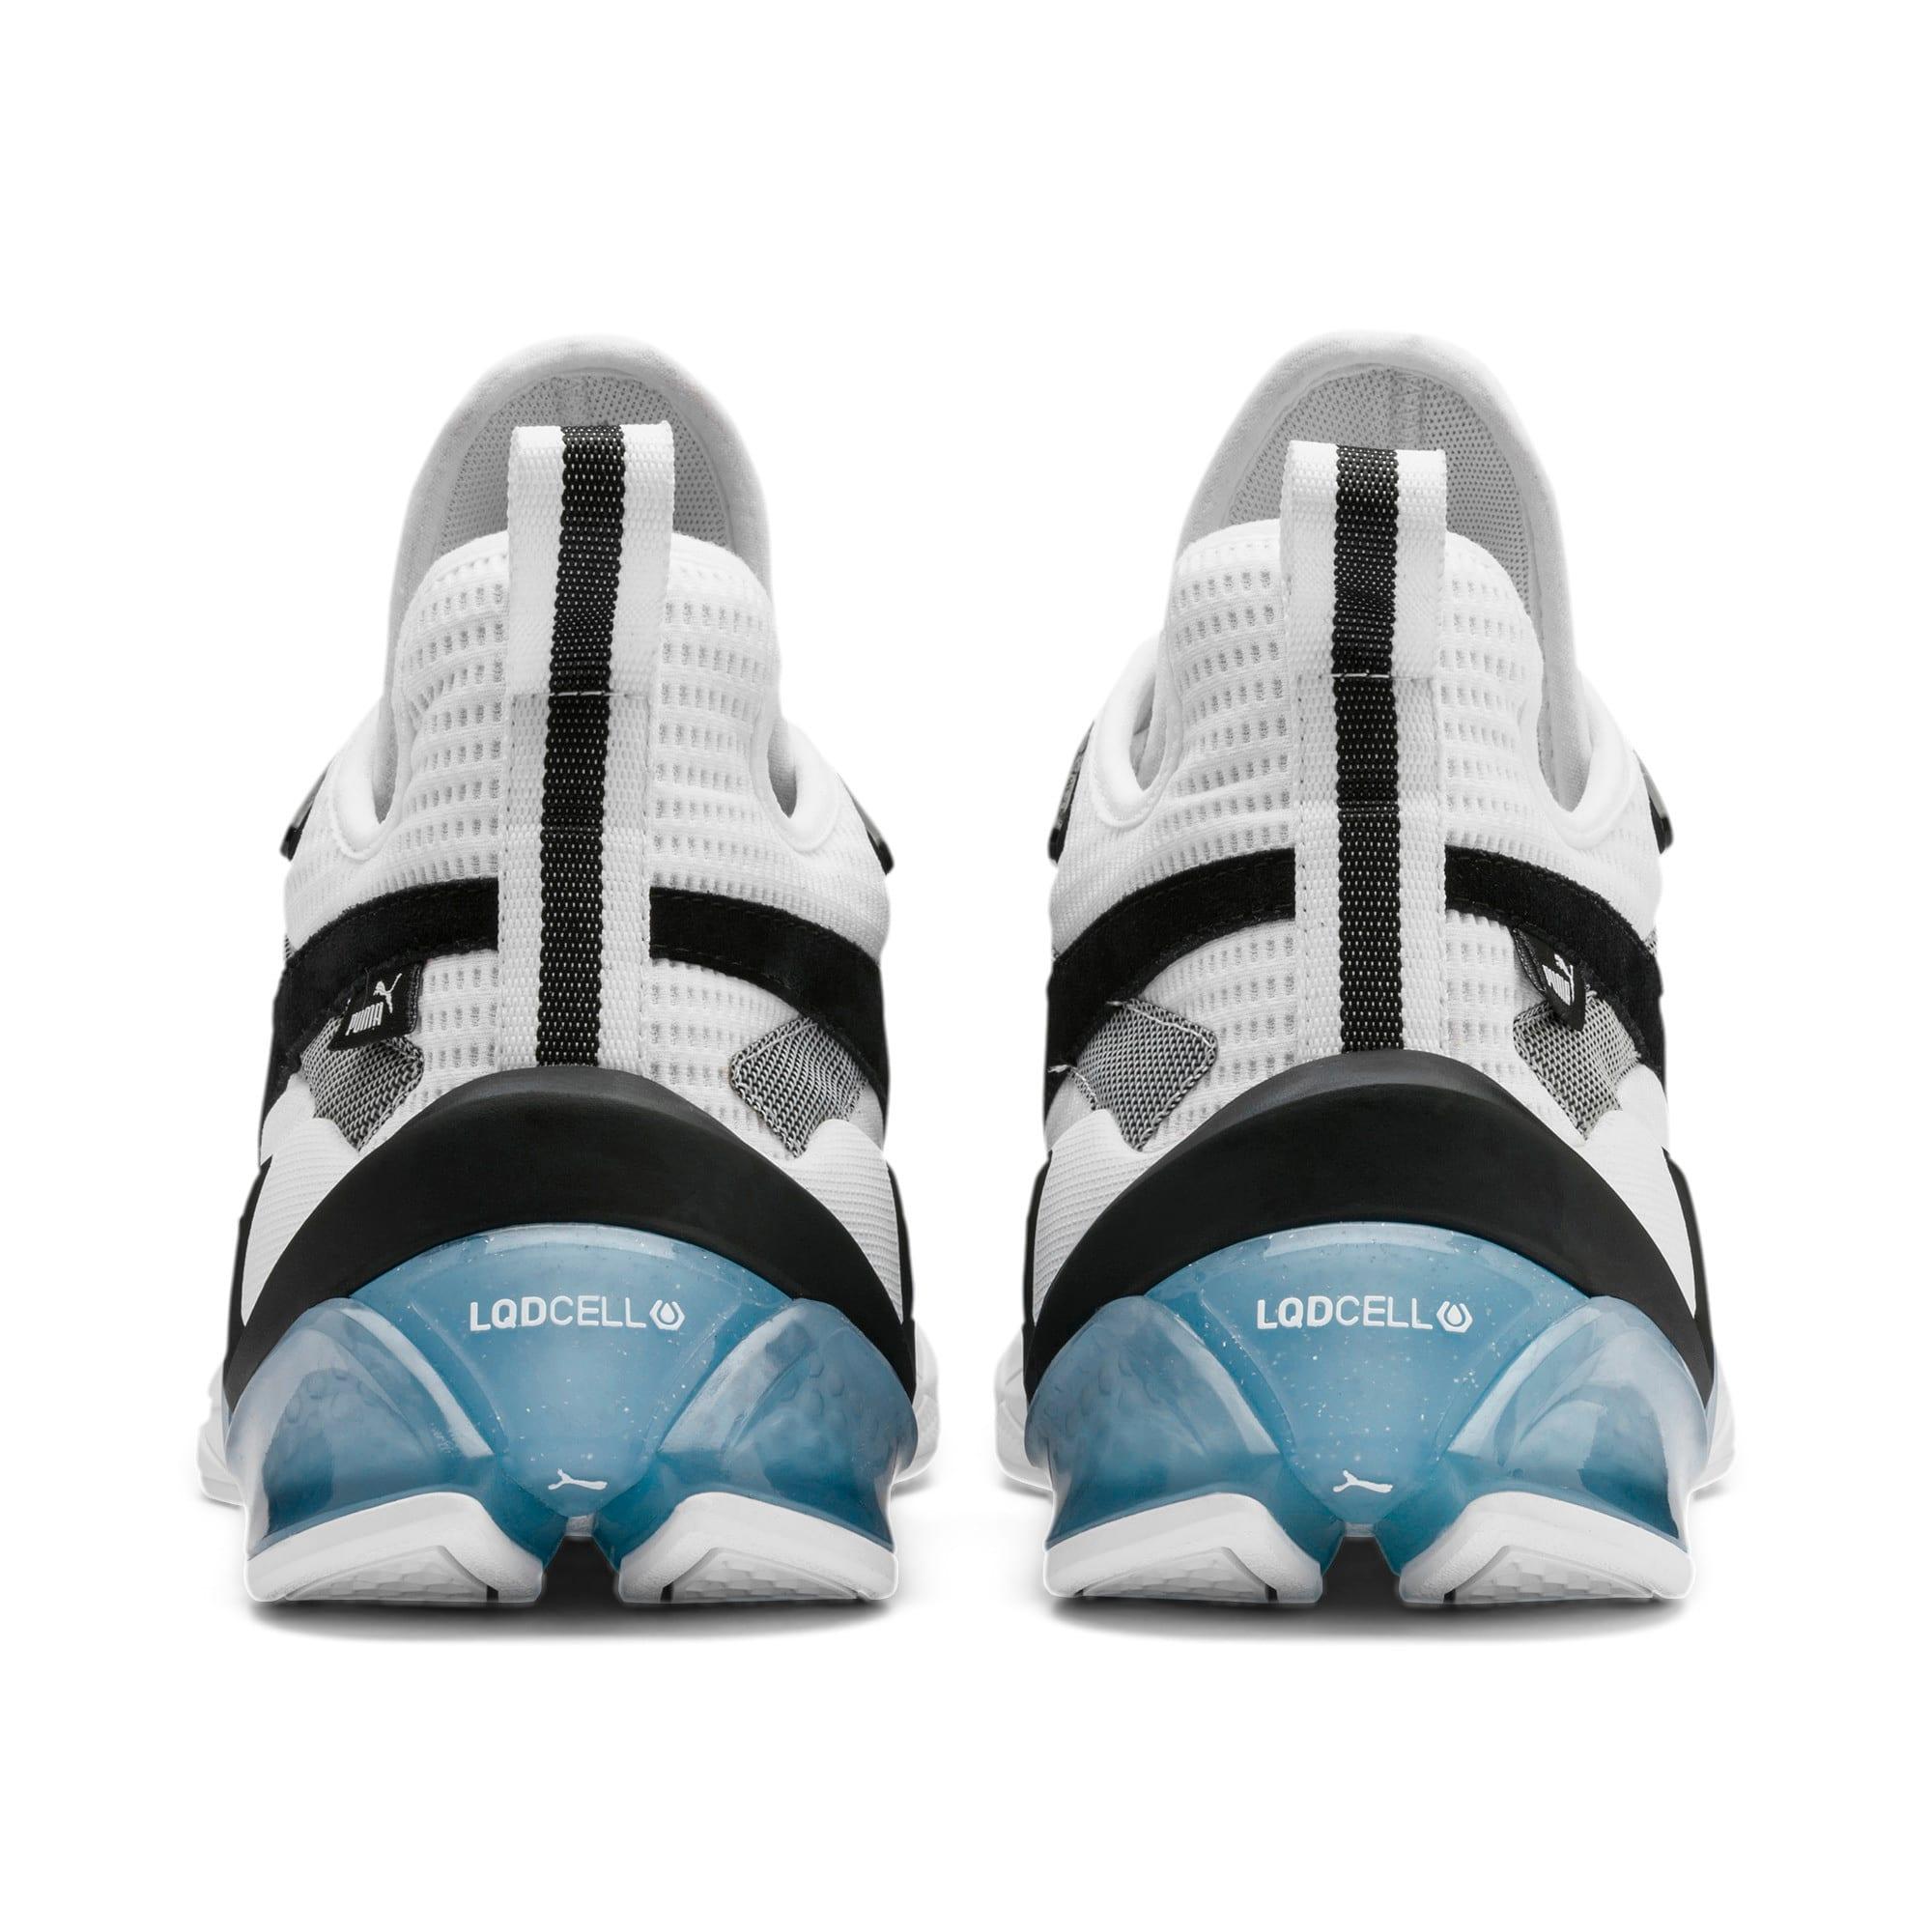 Thumbnail 4 of LQDCELL Origin Men's Training Shoes, Puma White-Puma Black, medium